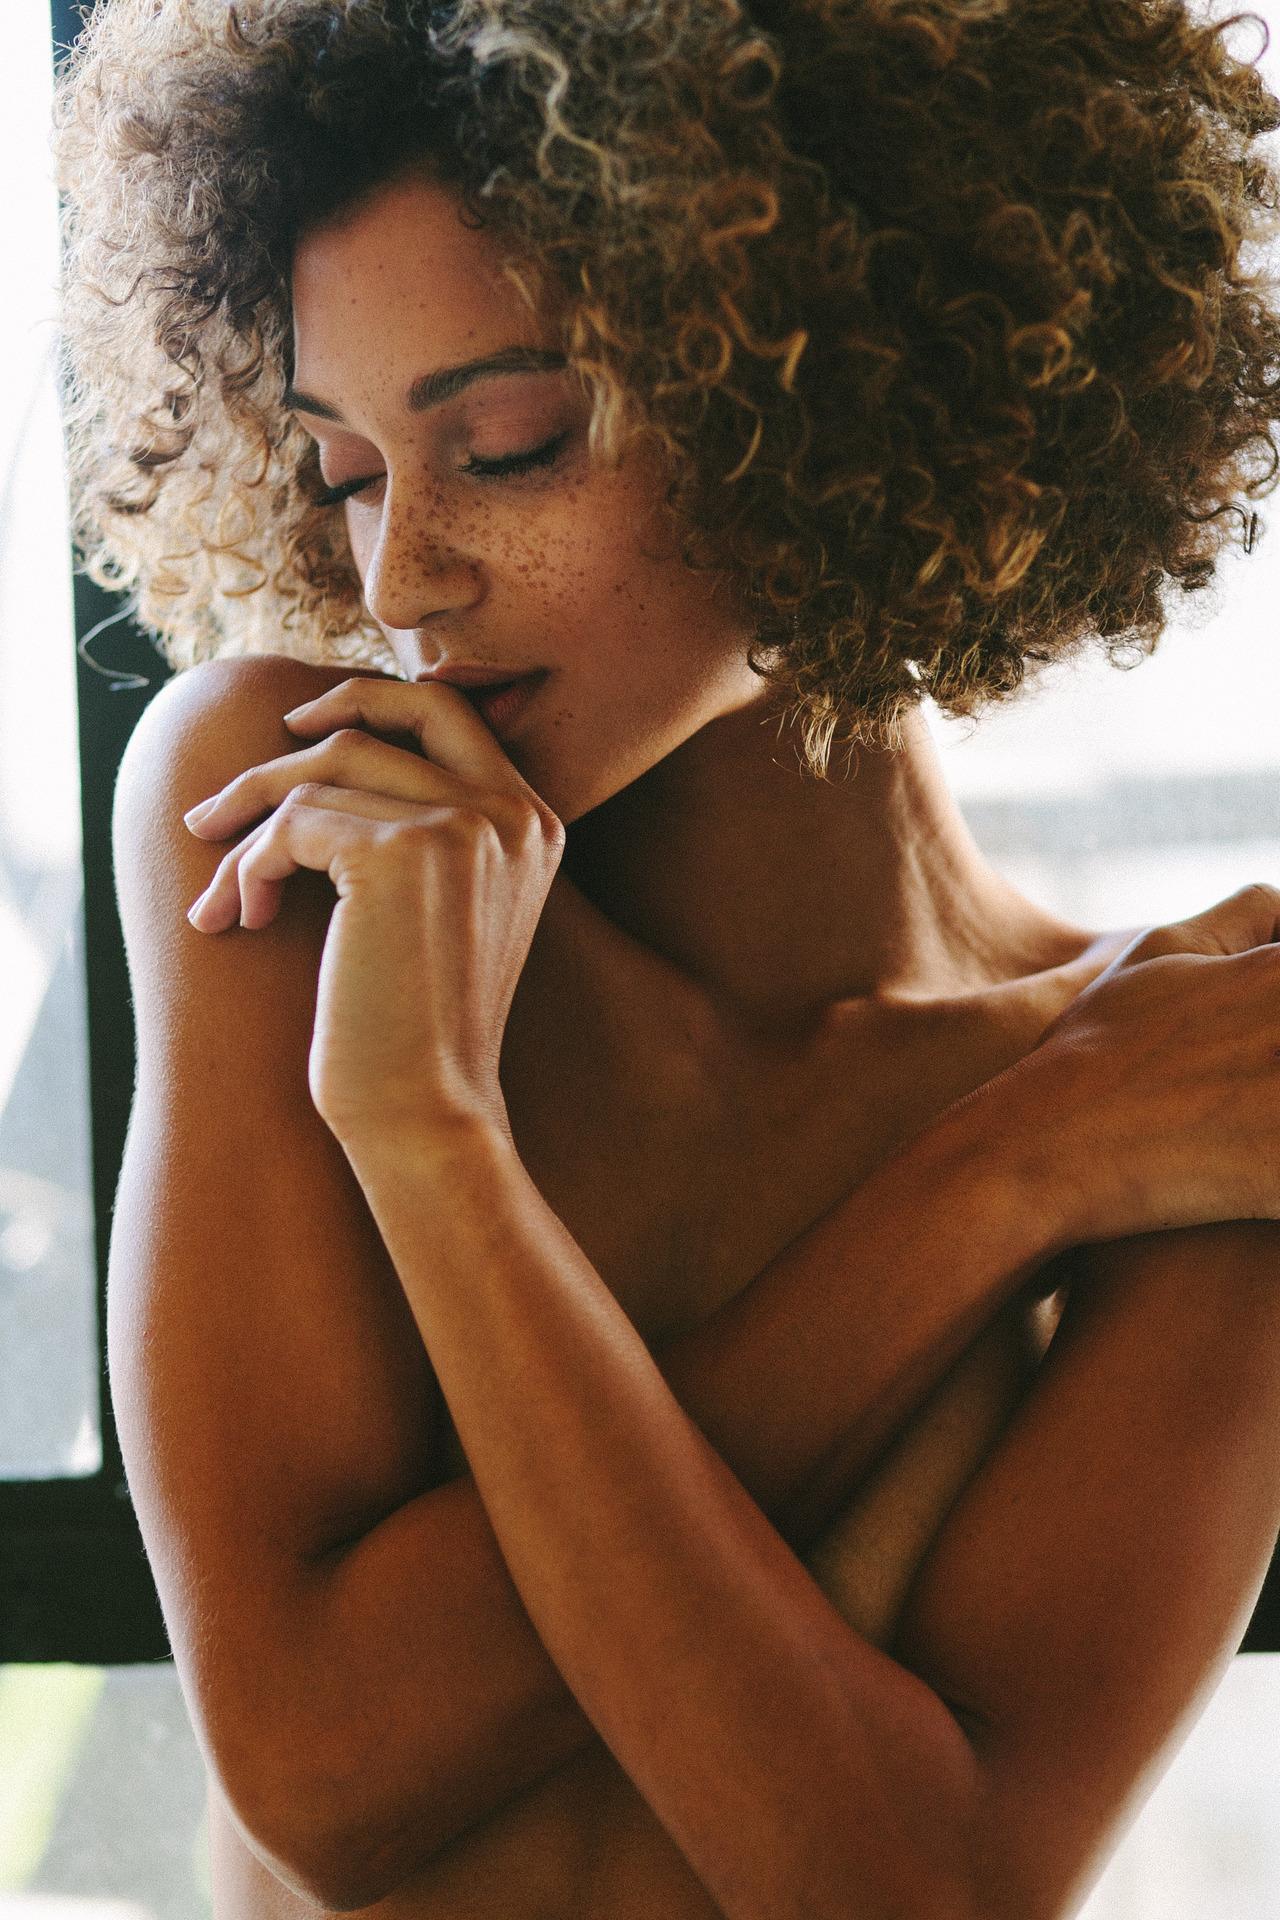 Brittany jackson naked